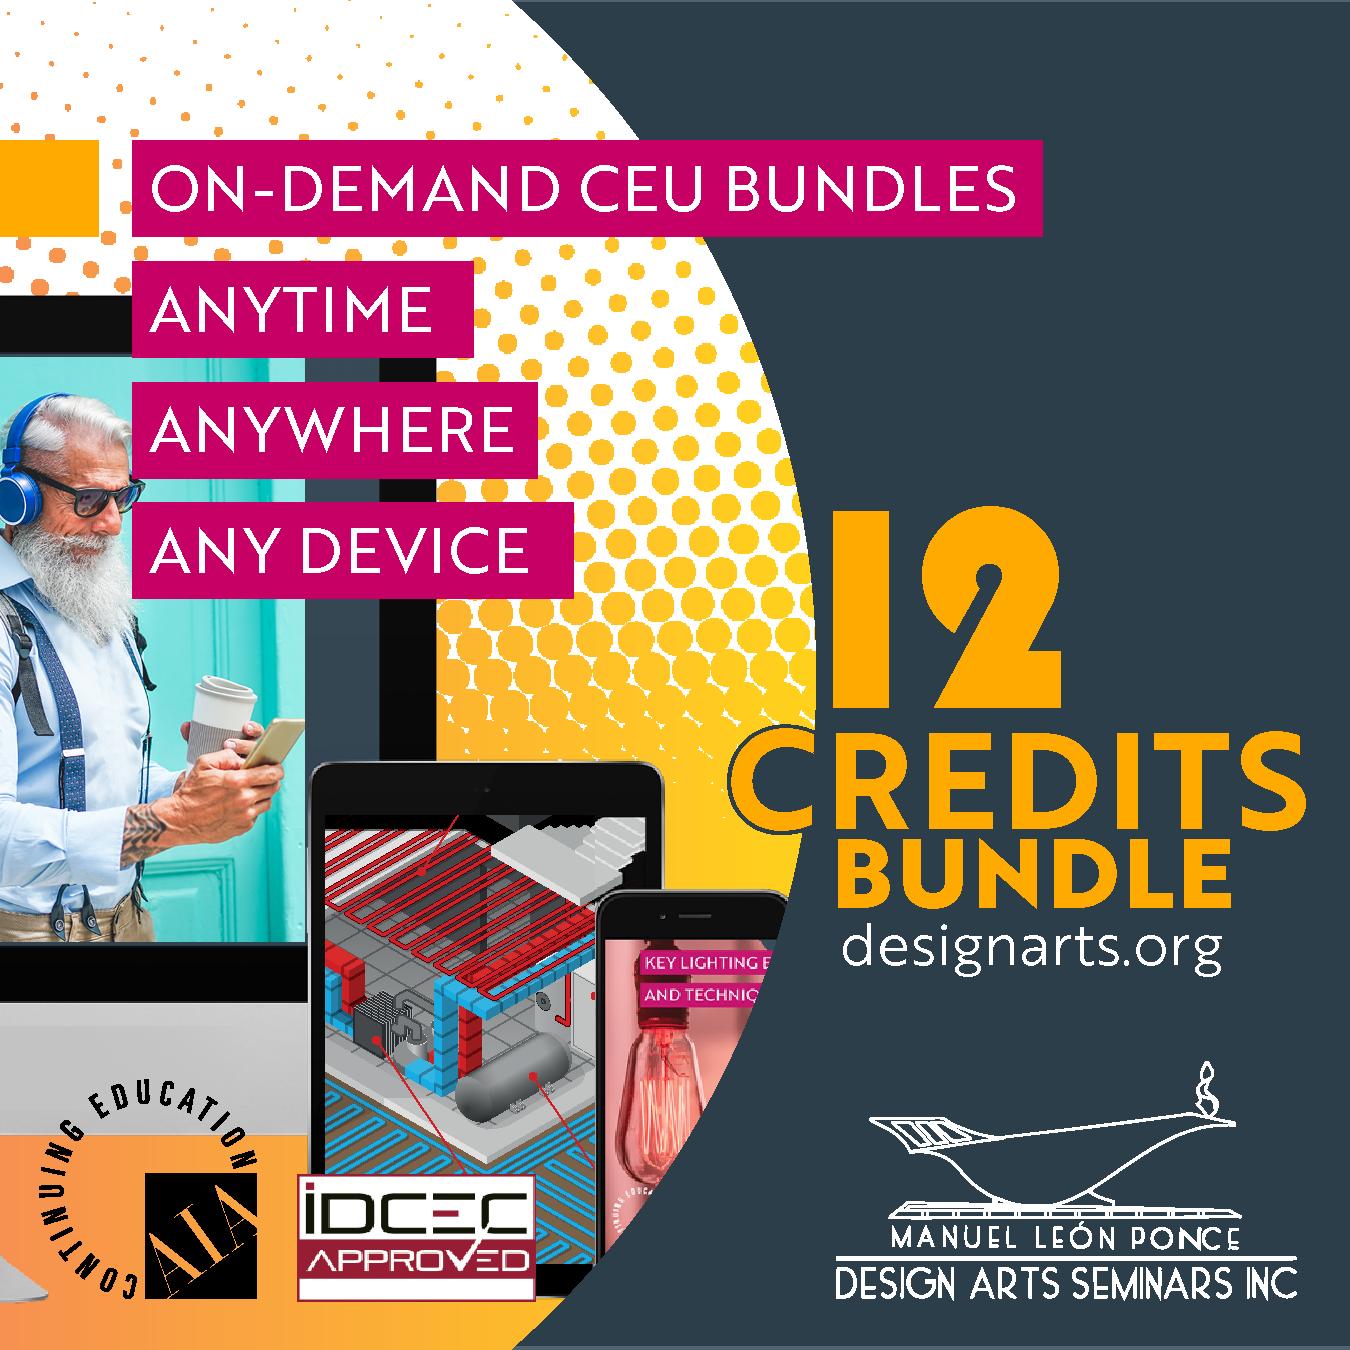 12-CREDIT ON-DEMAND WEBINAR BUNDLE